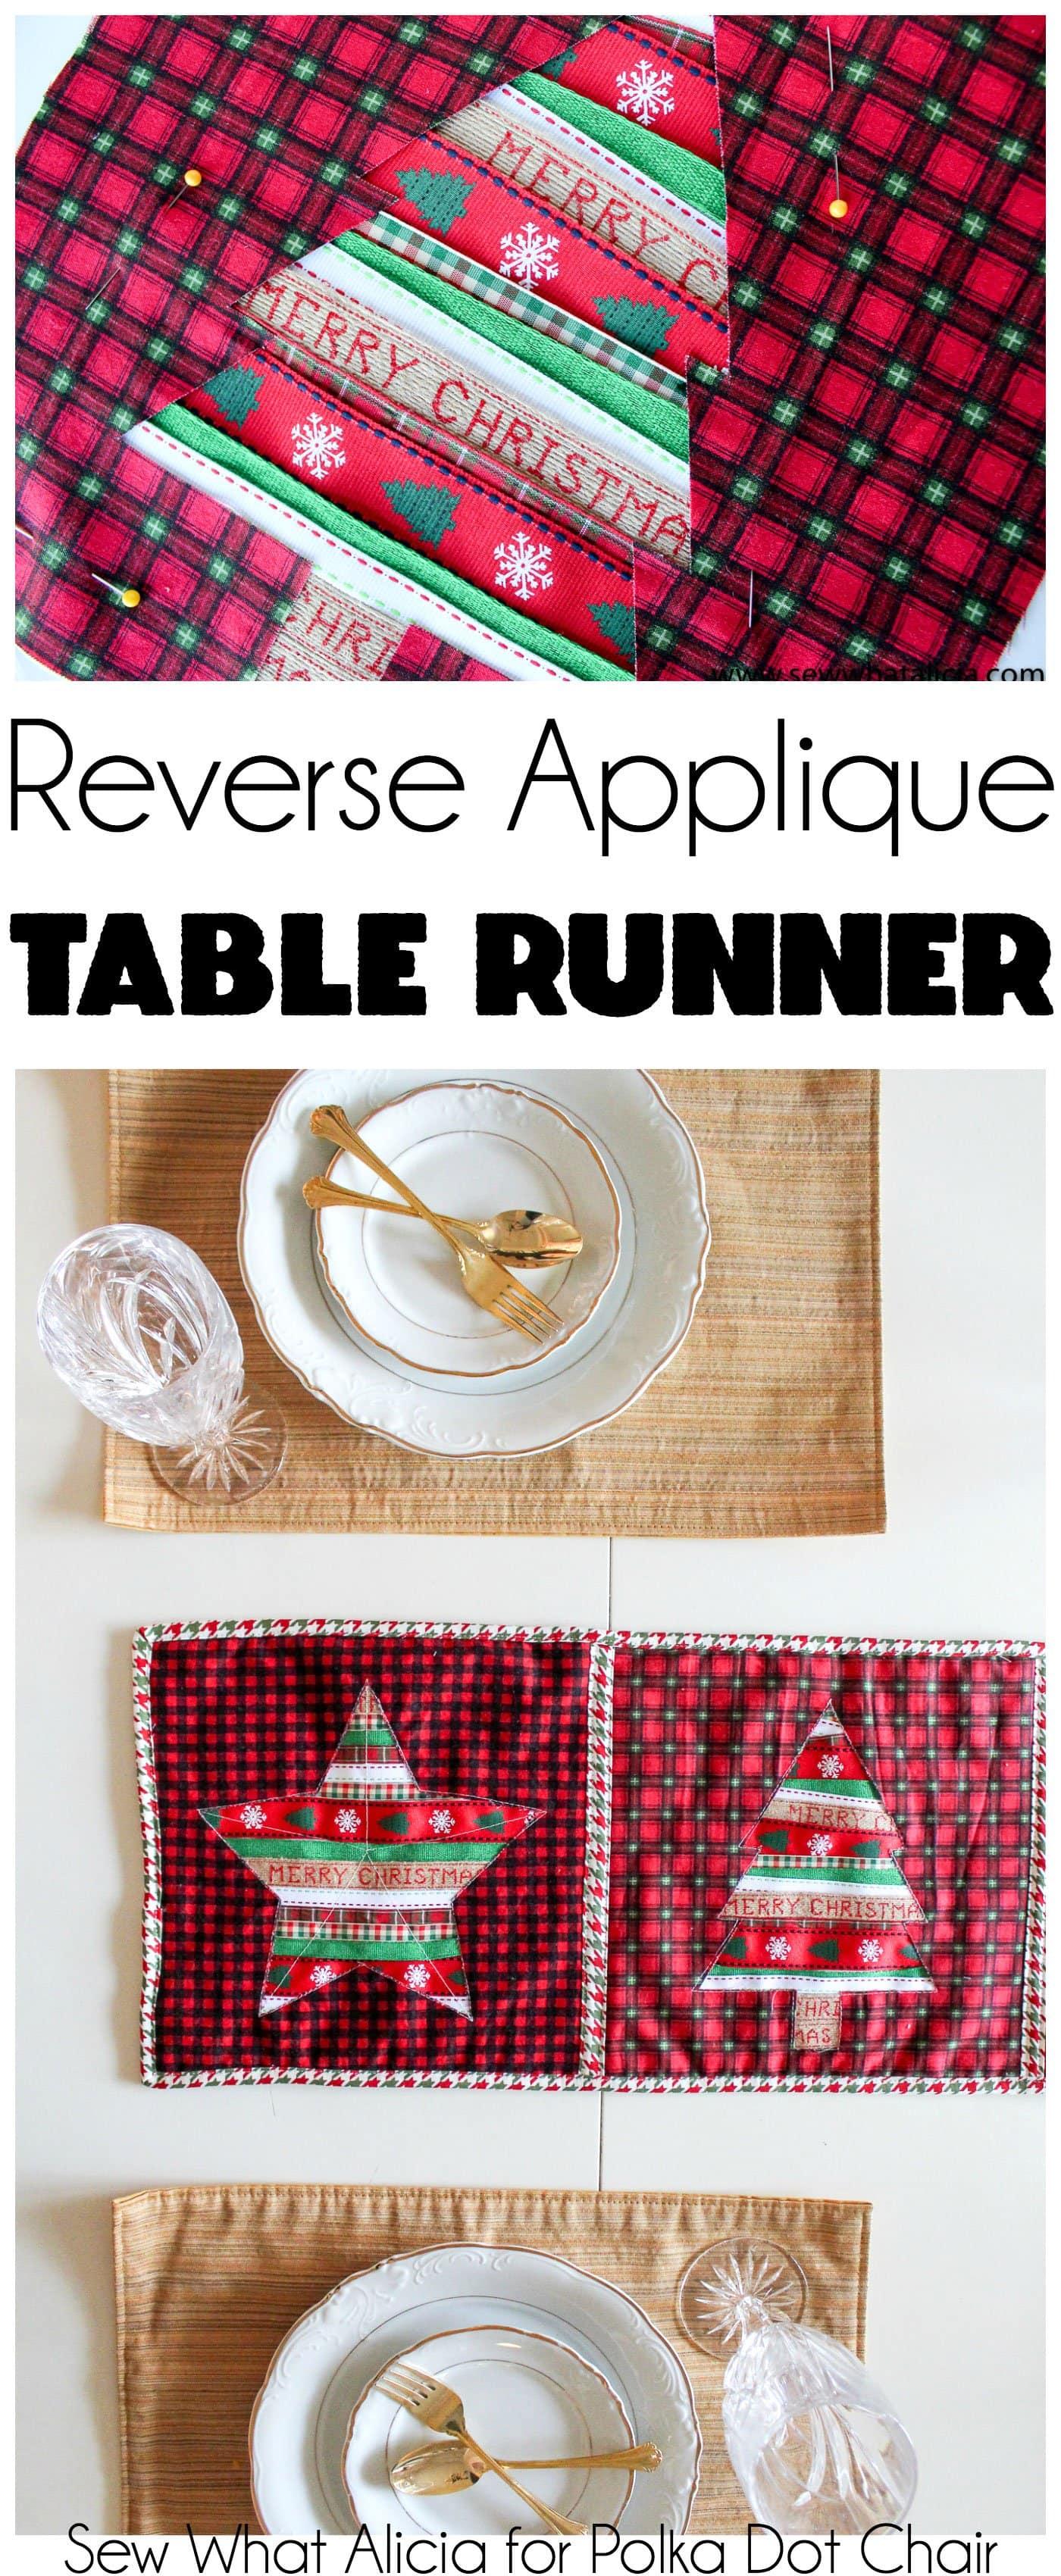 Reverse Applique Christmas Table Runner Tutorial The